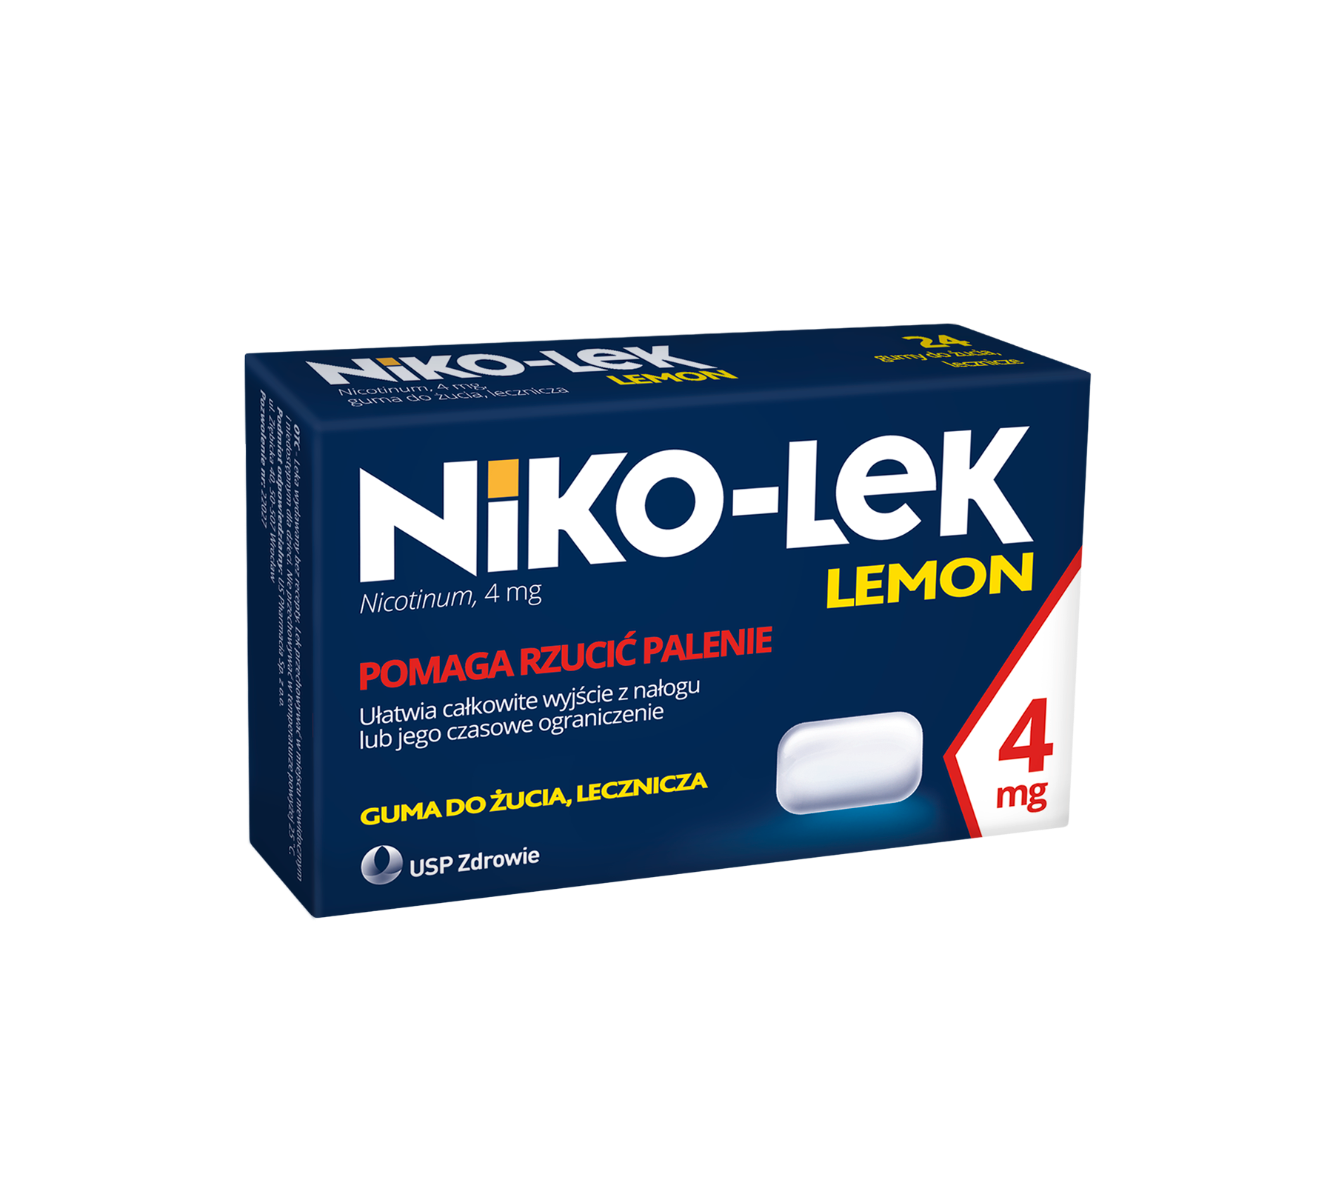 Niko-Lek Lemon (Niccorex Lemon)